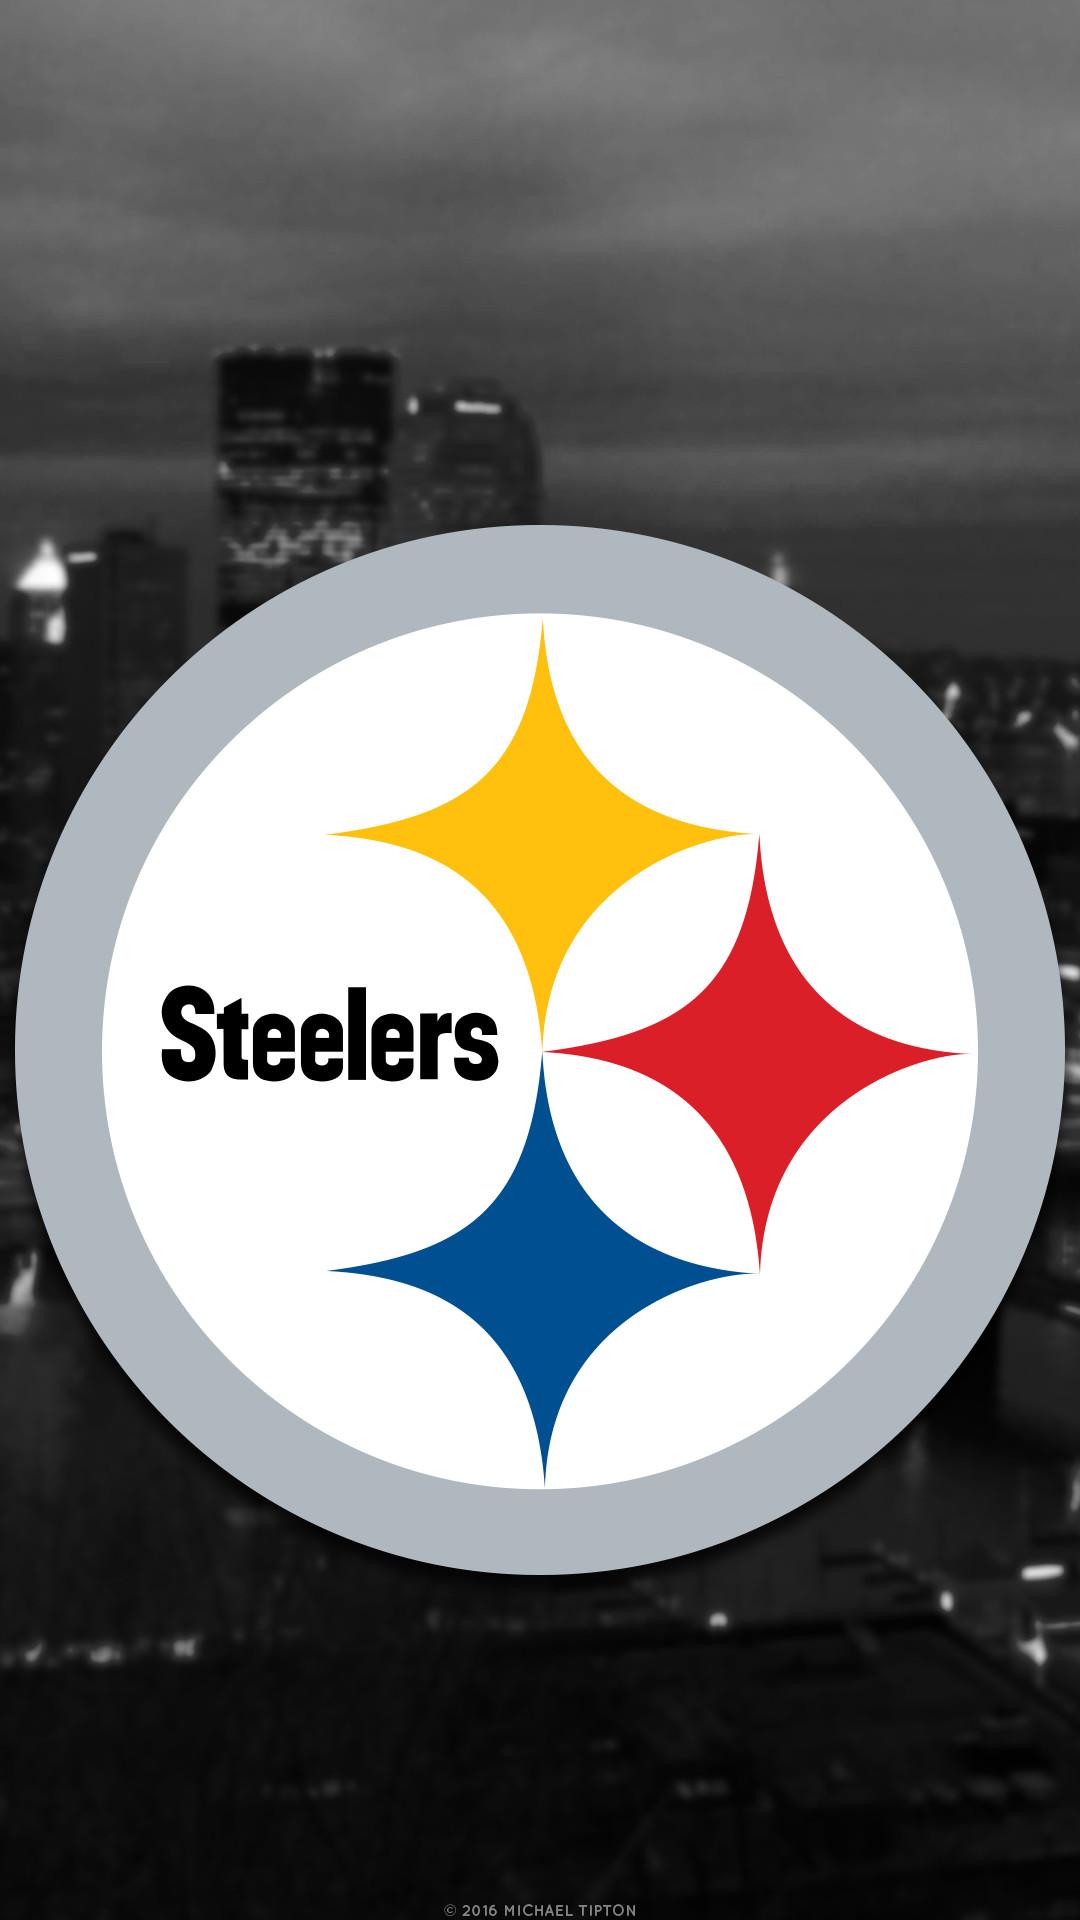 … galaxy Pittsburgh Steelers city 2017 logo wallpaper free iphone 5, 6,  7, galaxy s6